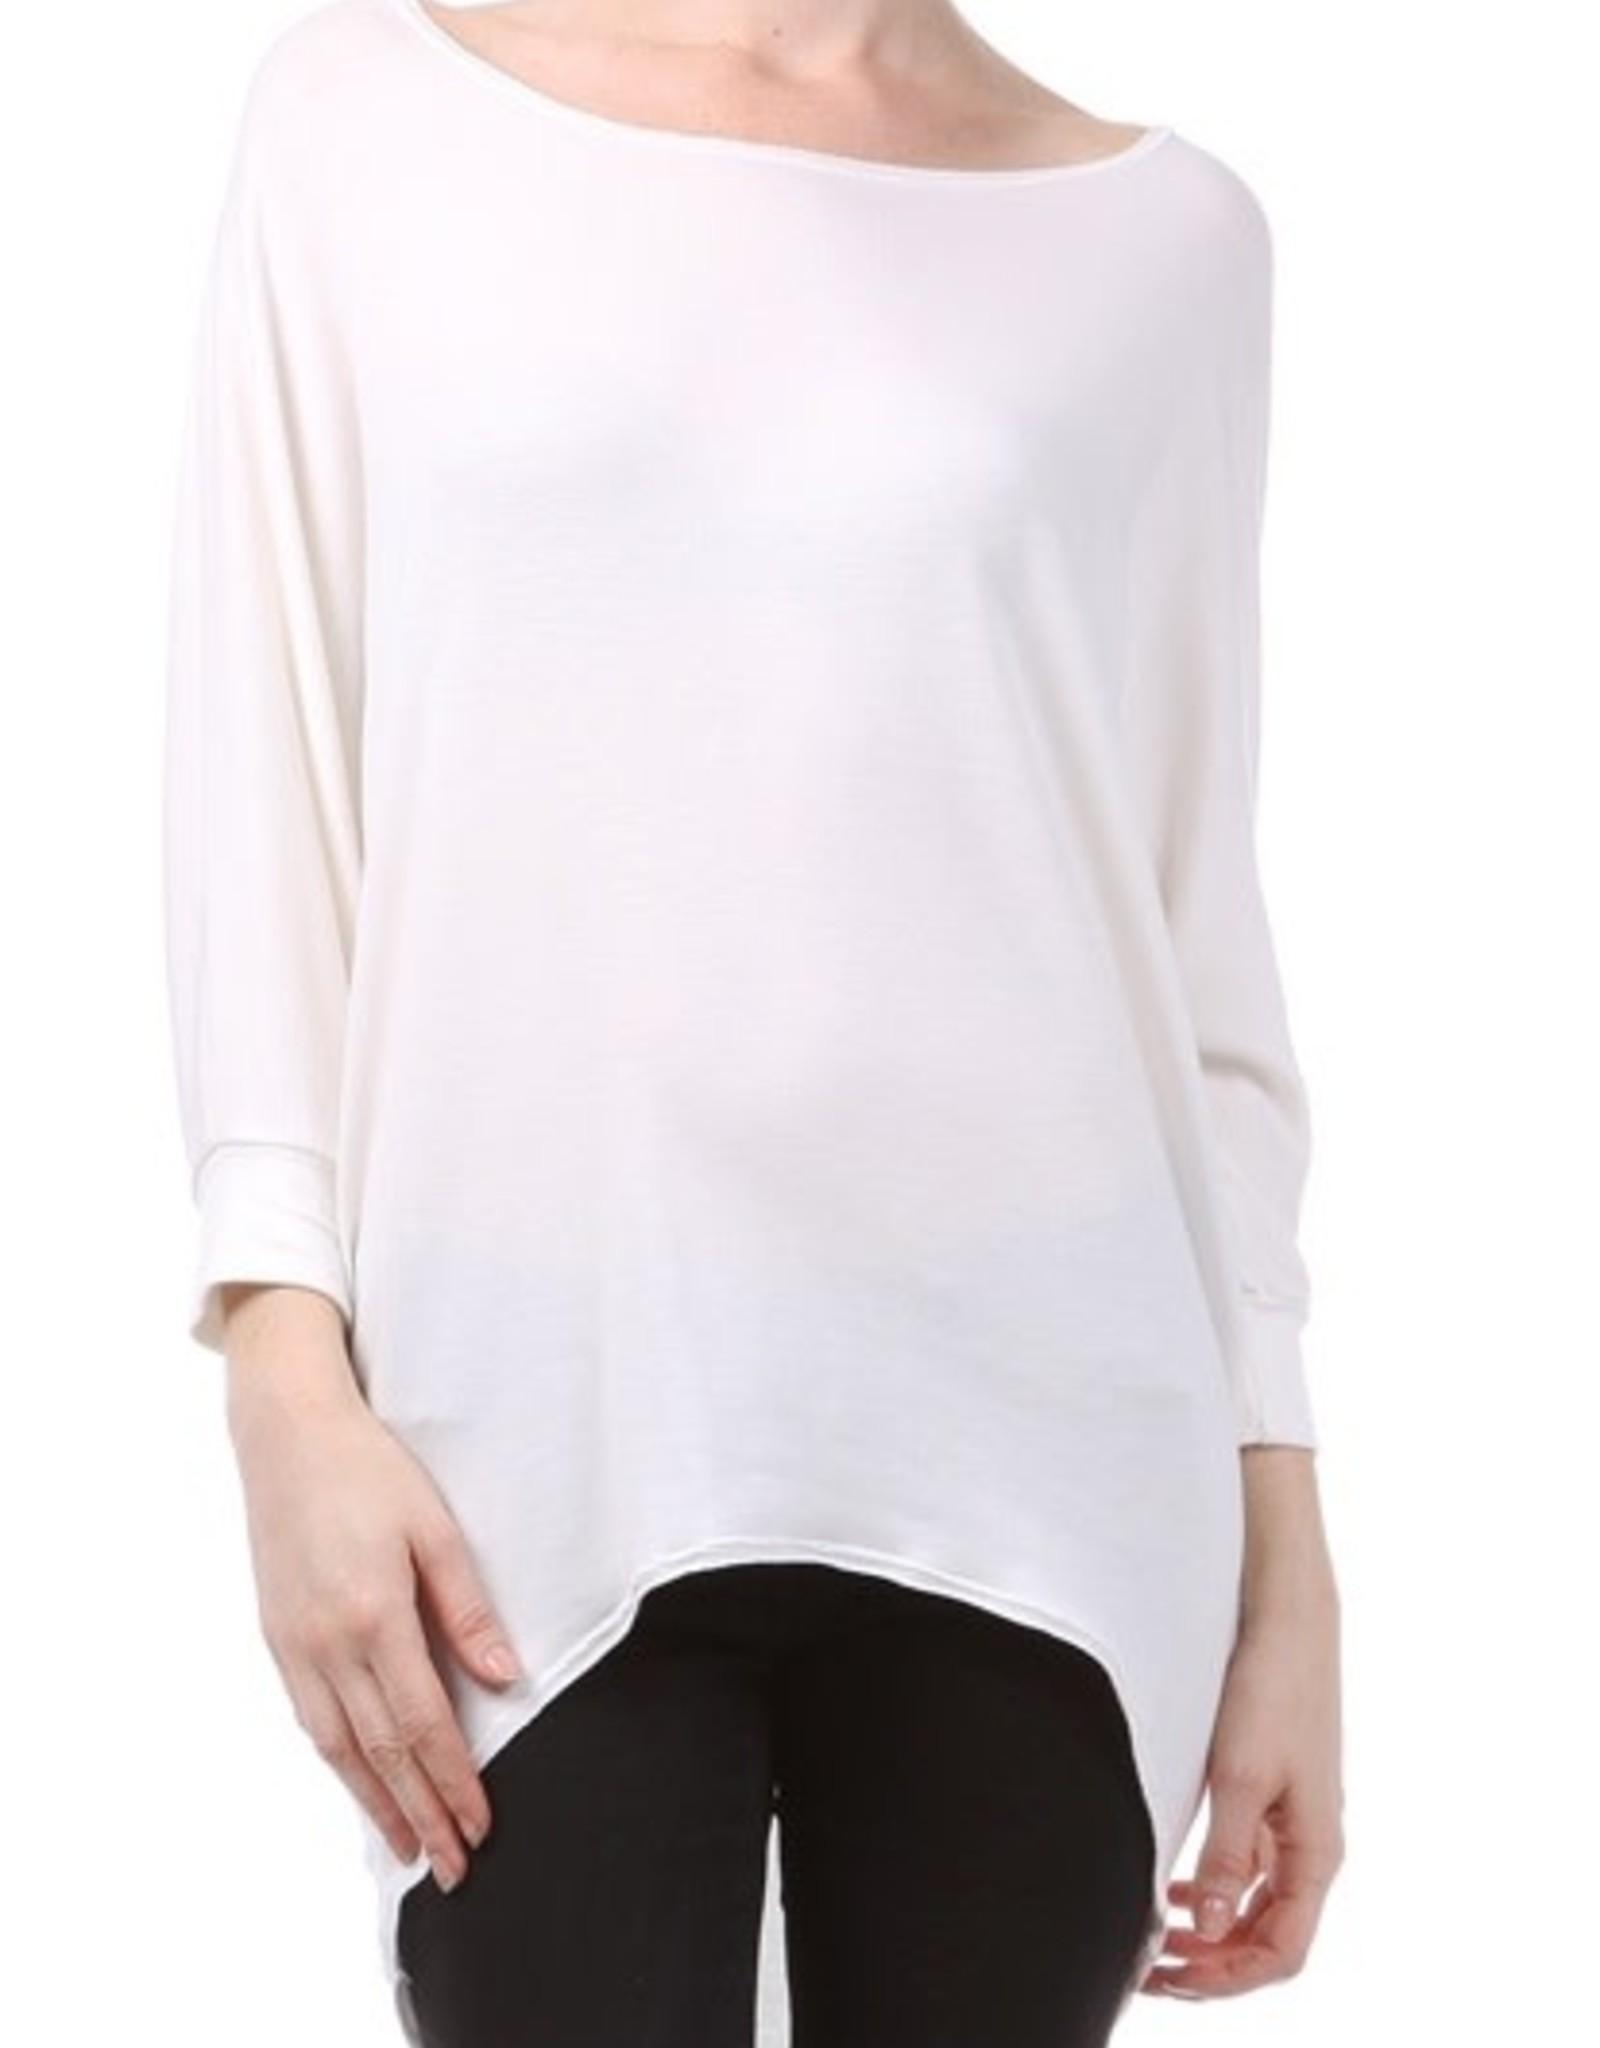 Miss Bliss Scoop Neck Dolman Sleeve Top- White